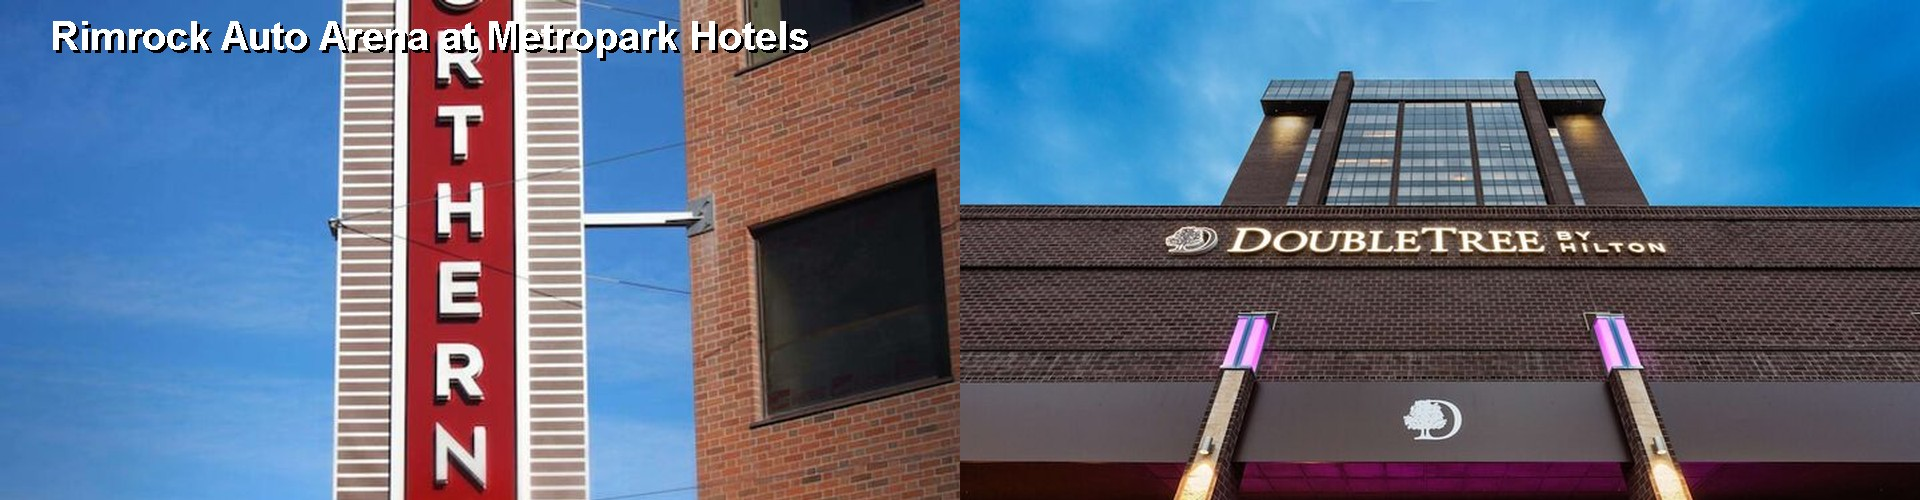 5 Best Hotels near Rimrock Auto Arena at Metropark & $38+ Hotels Near Rimrock Auto Arena at Metropark in Billings MT azcodes.com